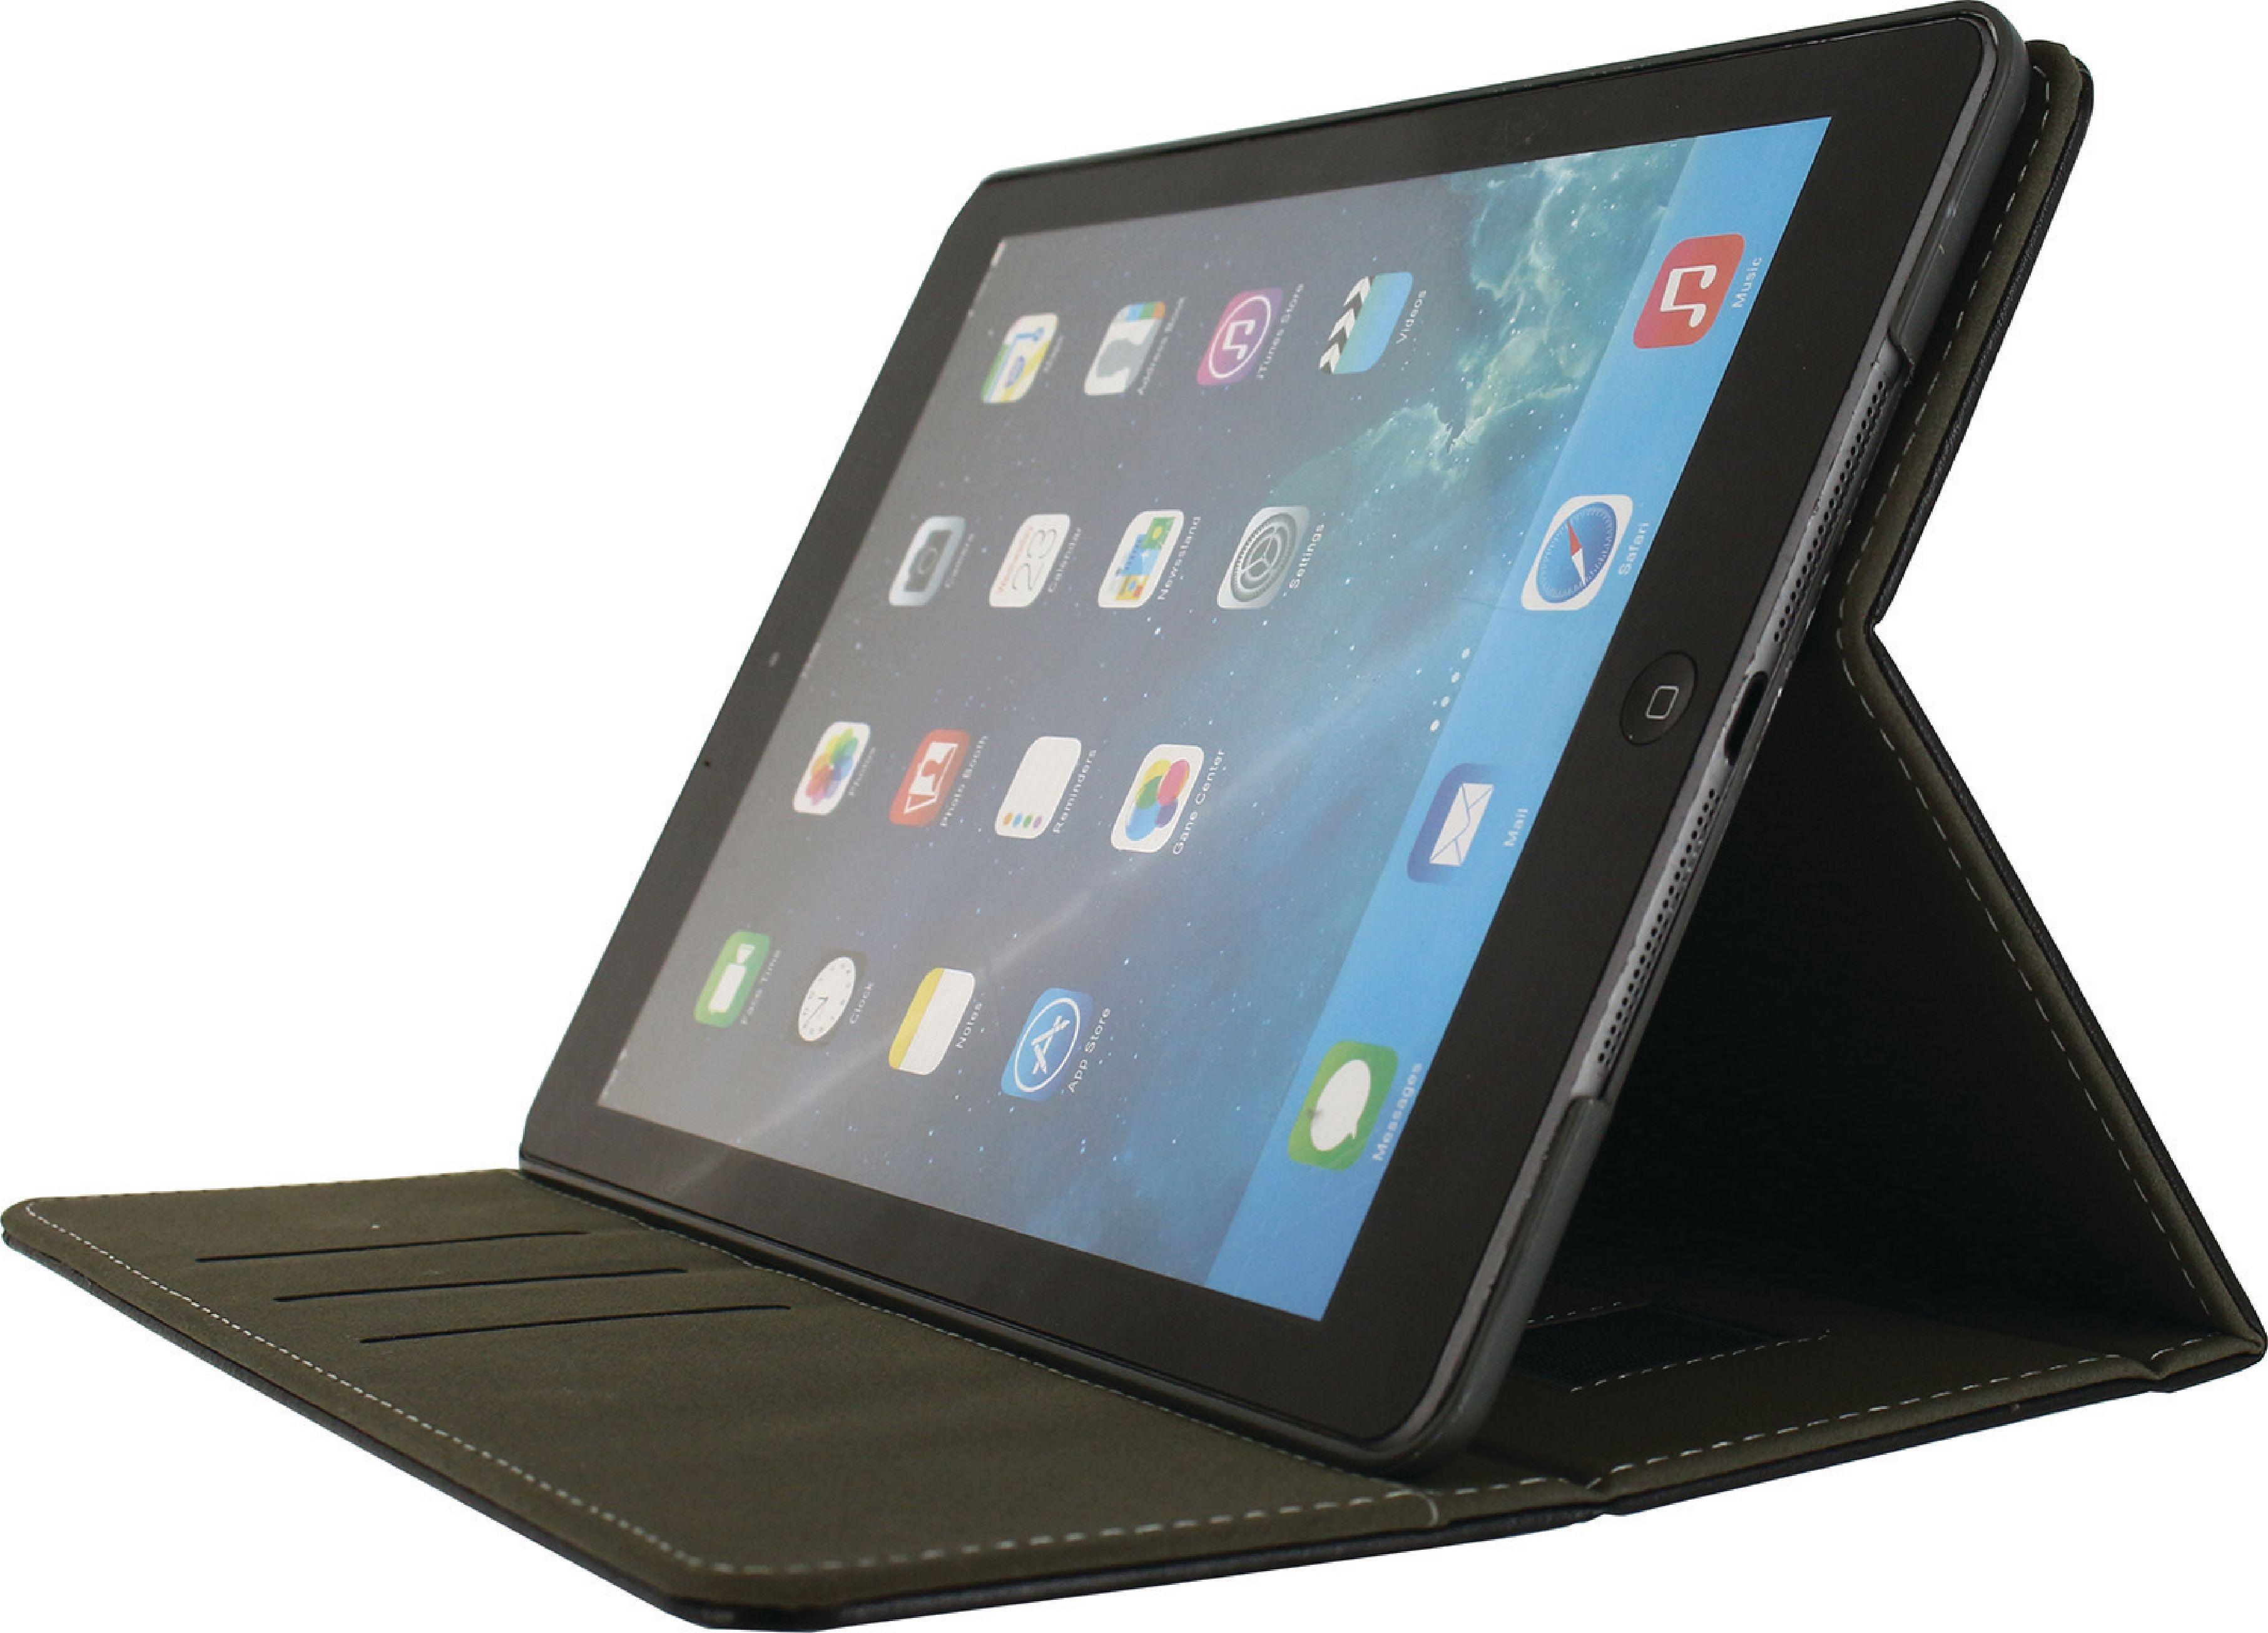 Billede af Tablet Premium Folieetui Apple iPad Air Sort